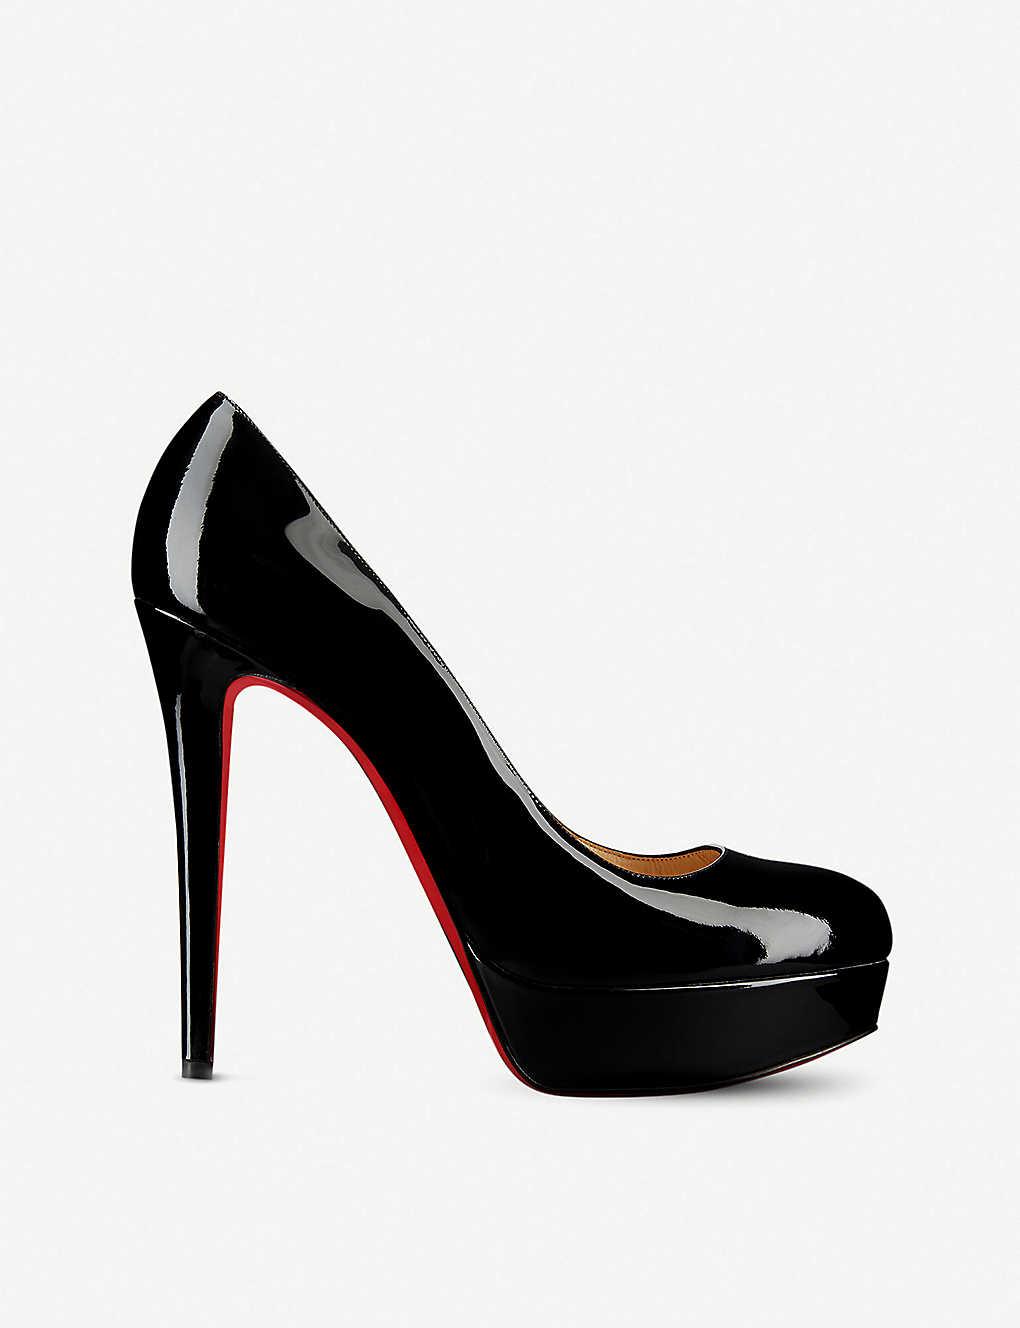 cbb8b8a2ee2 CHRISTIAN LOUBOUTIN - Bianca 140 patent calf